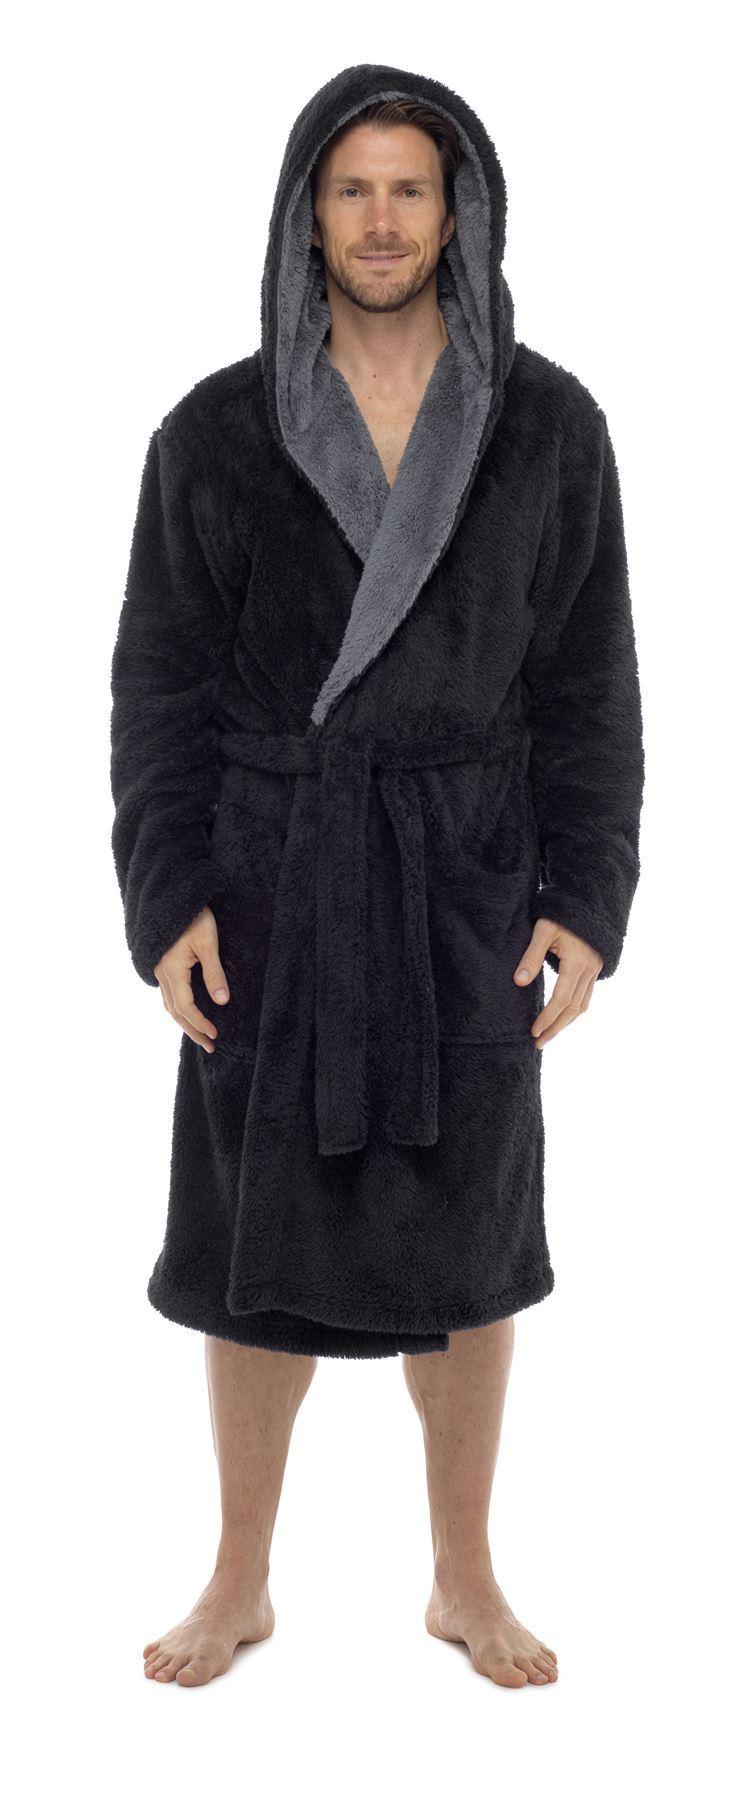 Men\'s Snuggle Fleece Robe, Luxury Super Soft Hooded Dressing Gown ...